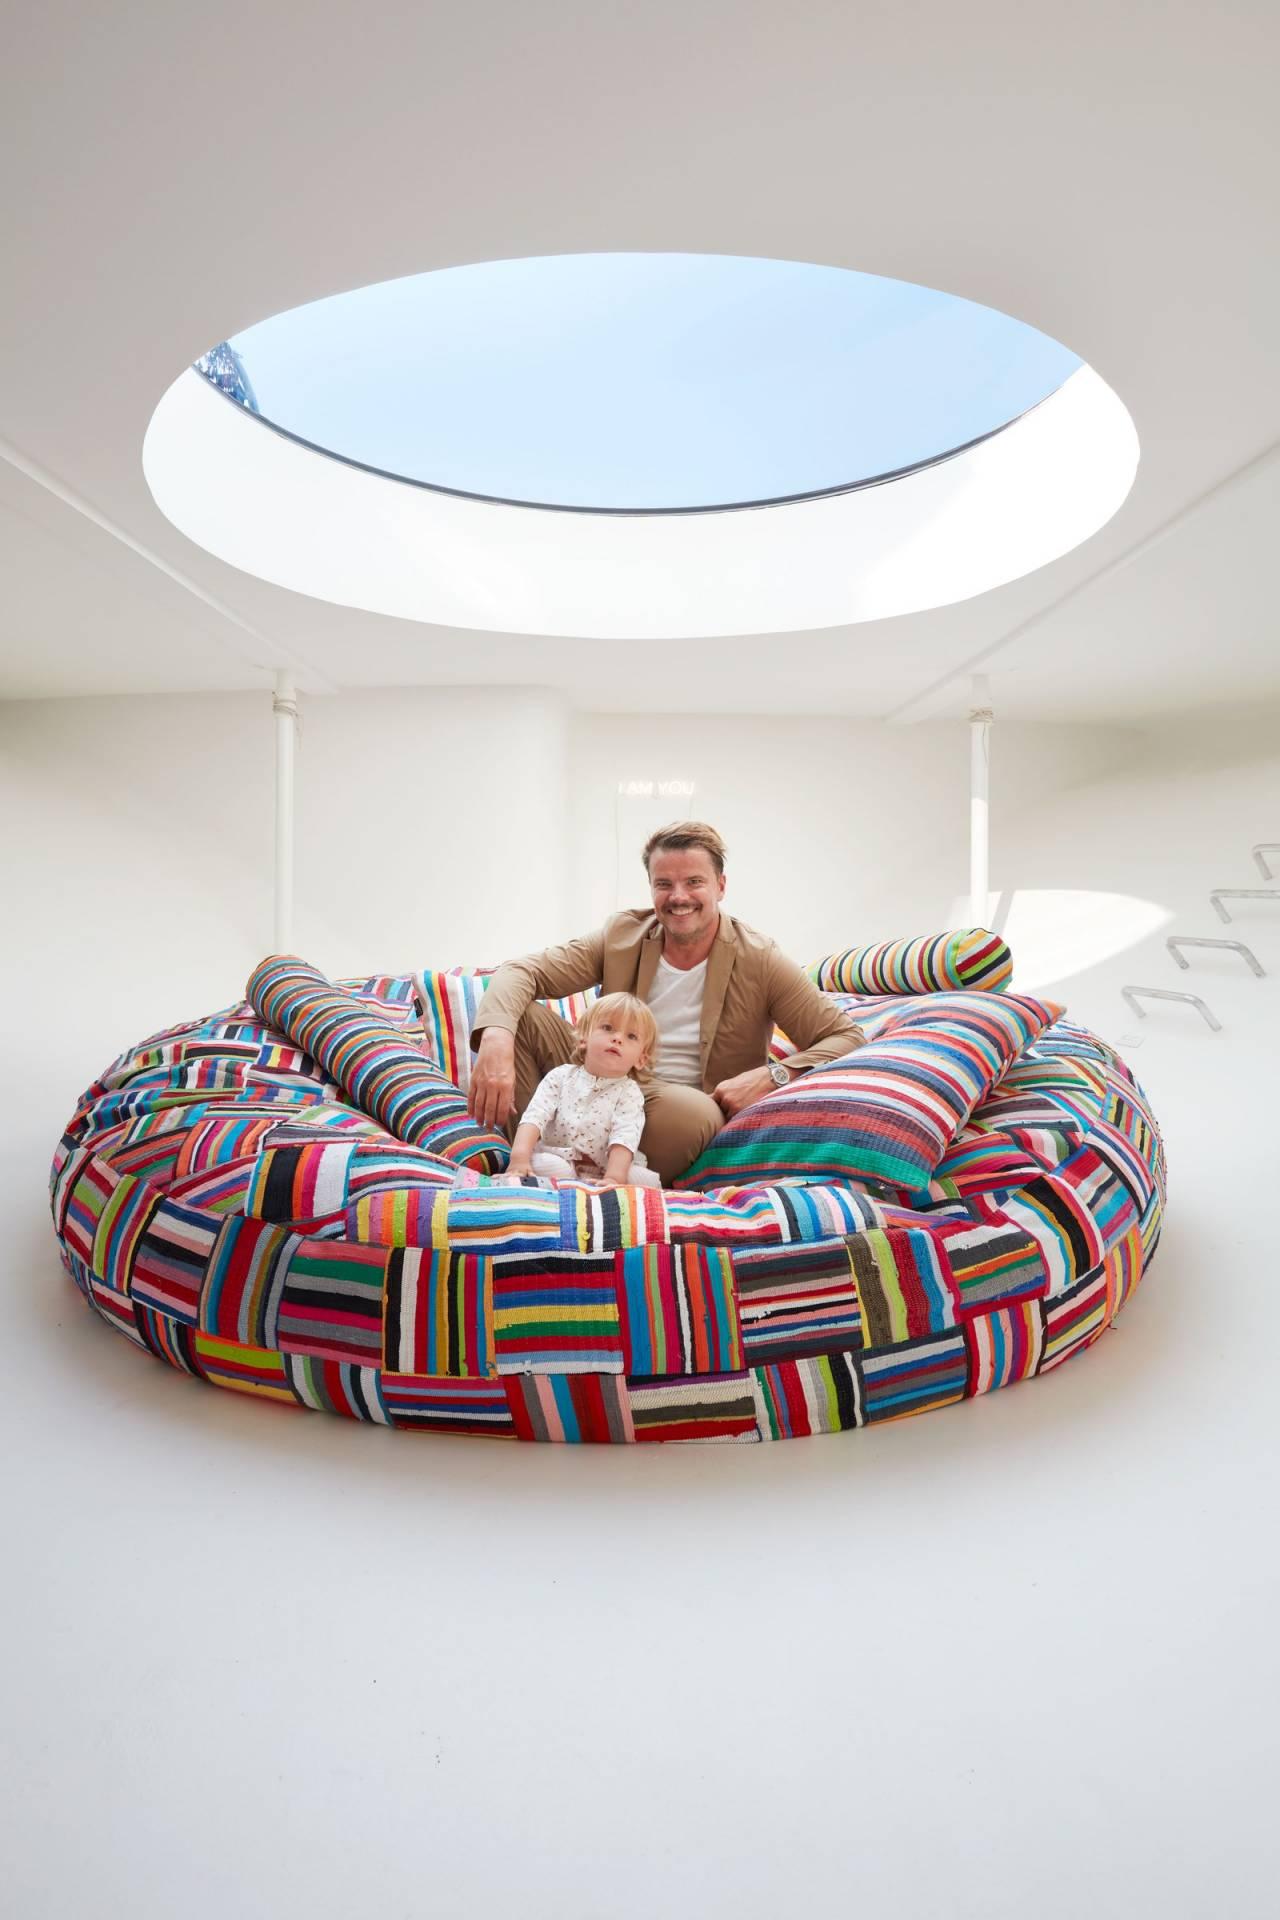 bjarke_ingels_houseboat_foto_pernille_loof_and_thomas_loof_designalive-12